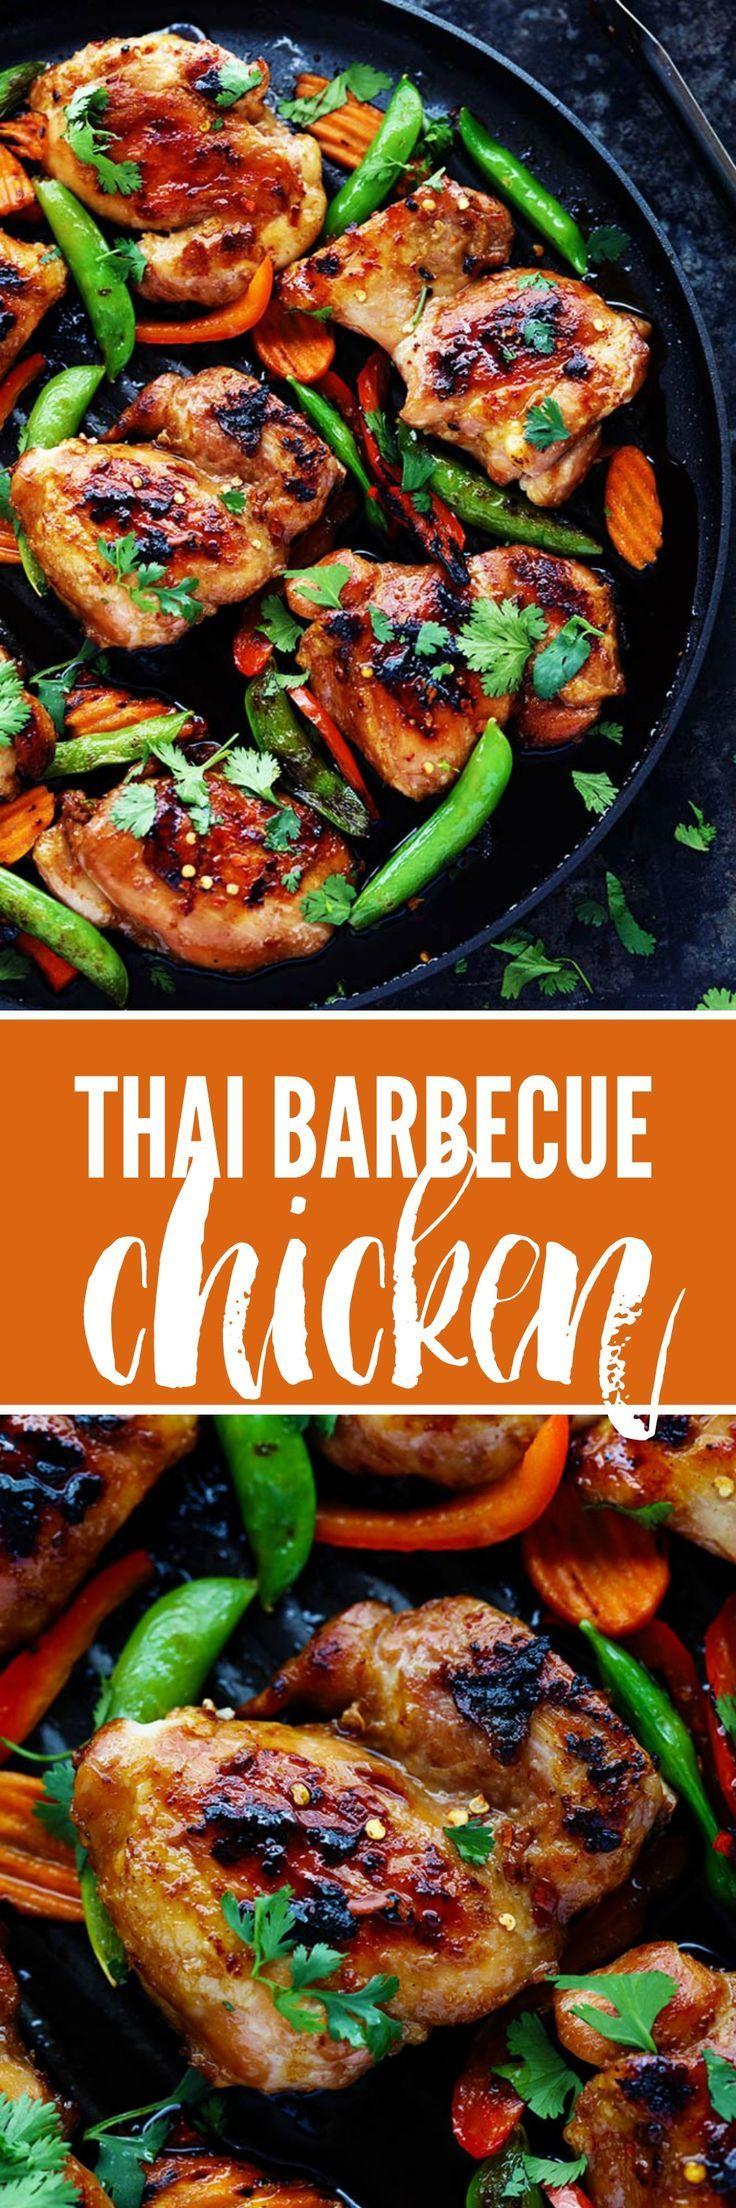 70 best Thai Küche images on Pinterest | Asian cuisine, Asian ...